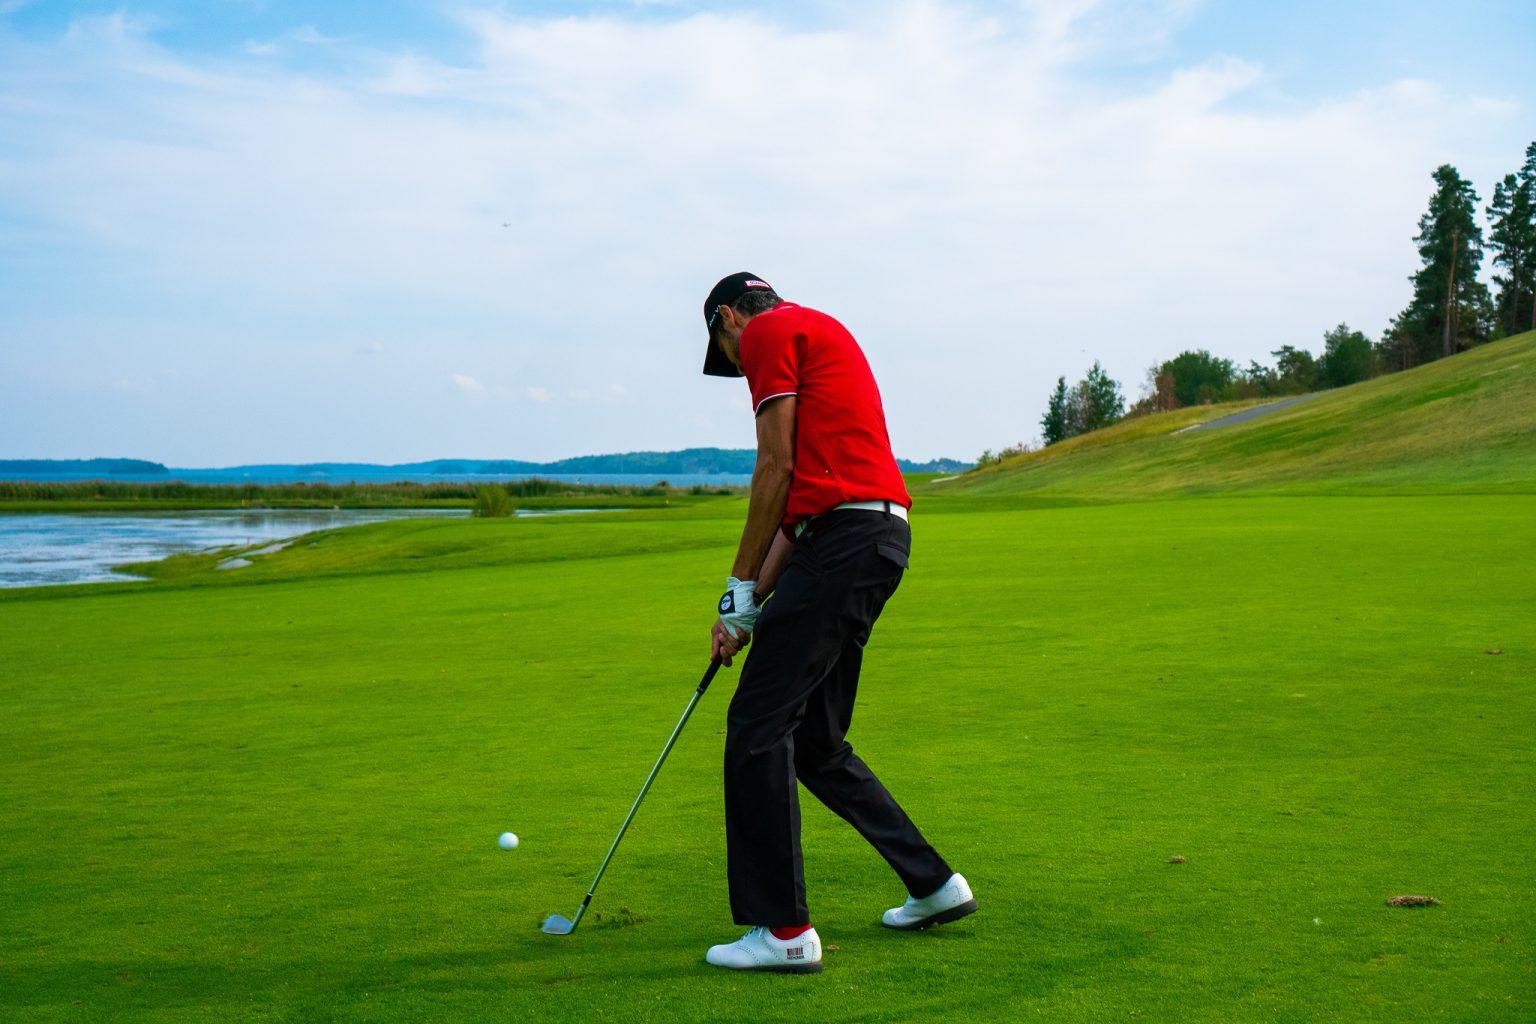 Golf swing mechanics | Kinexit